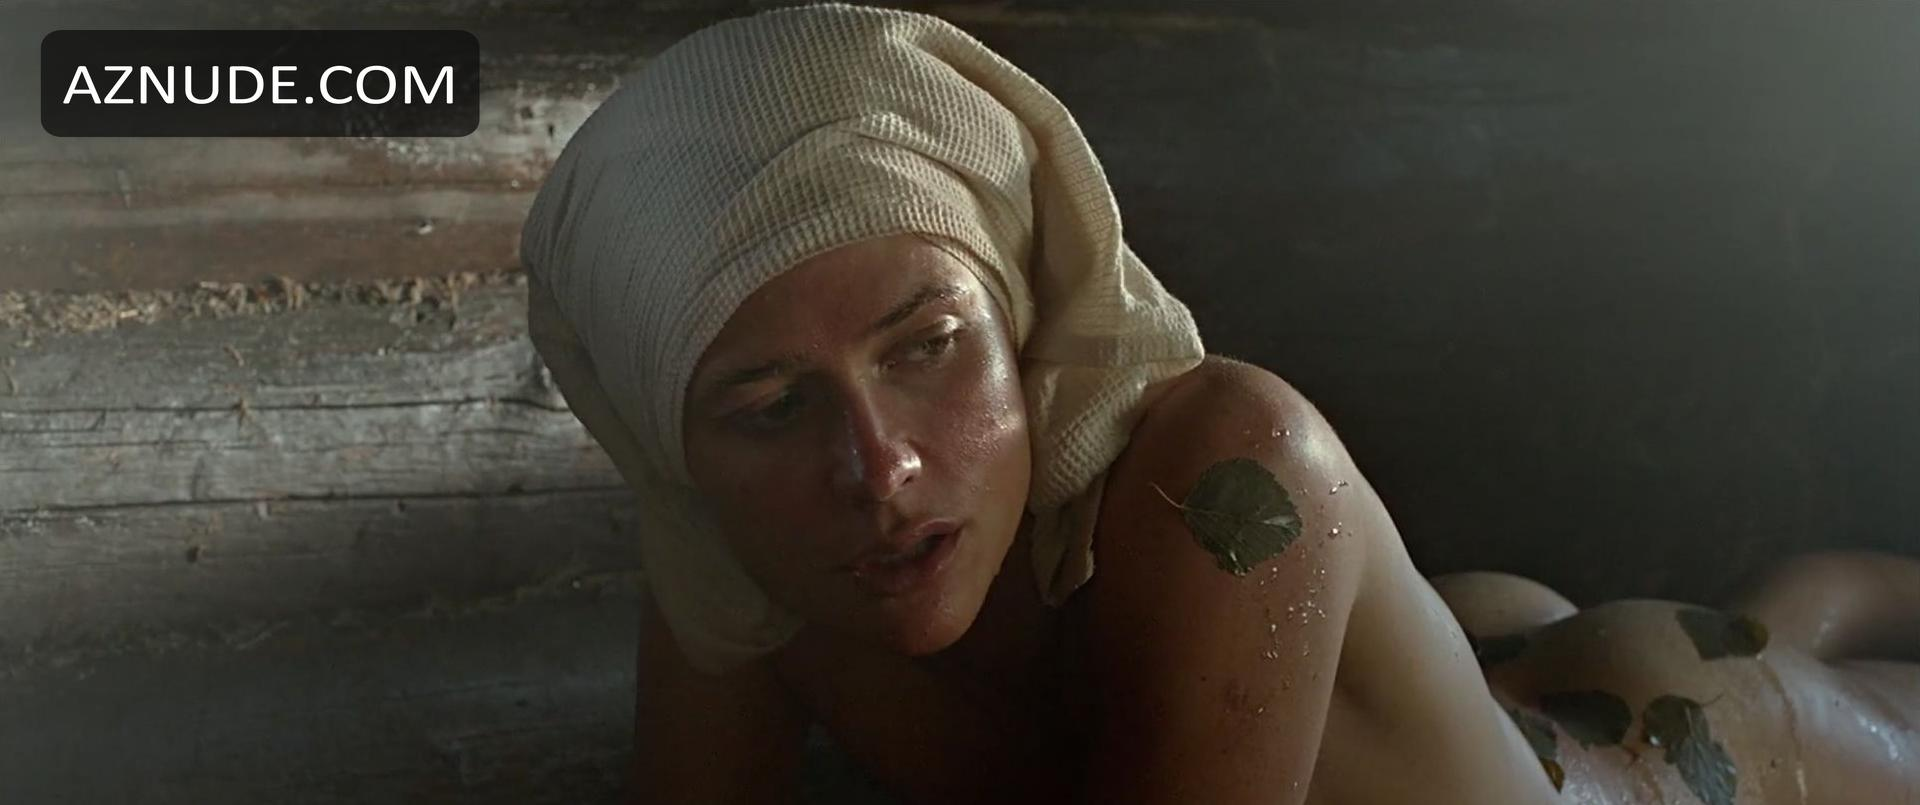 Fuck Anastasiya Mikulchina nude (17 foto and video), Ass, Fappening, Boobs, cleavage 2020